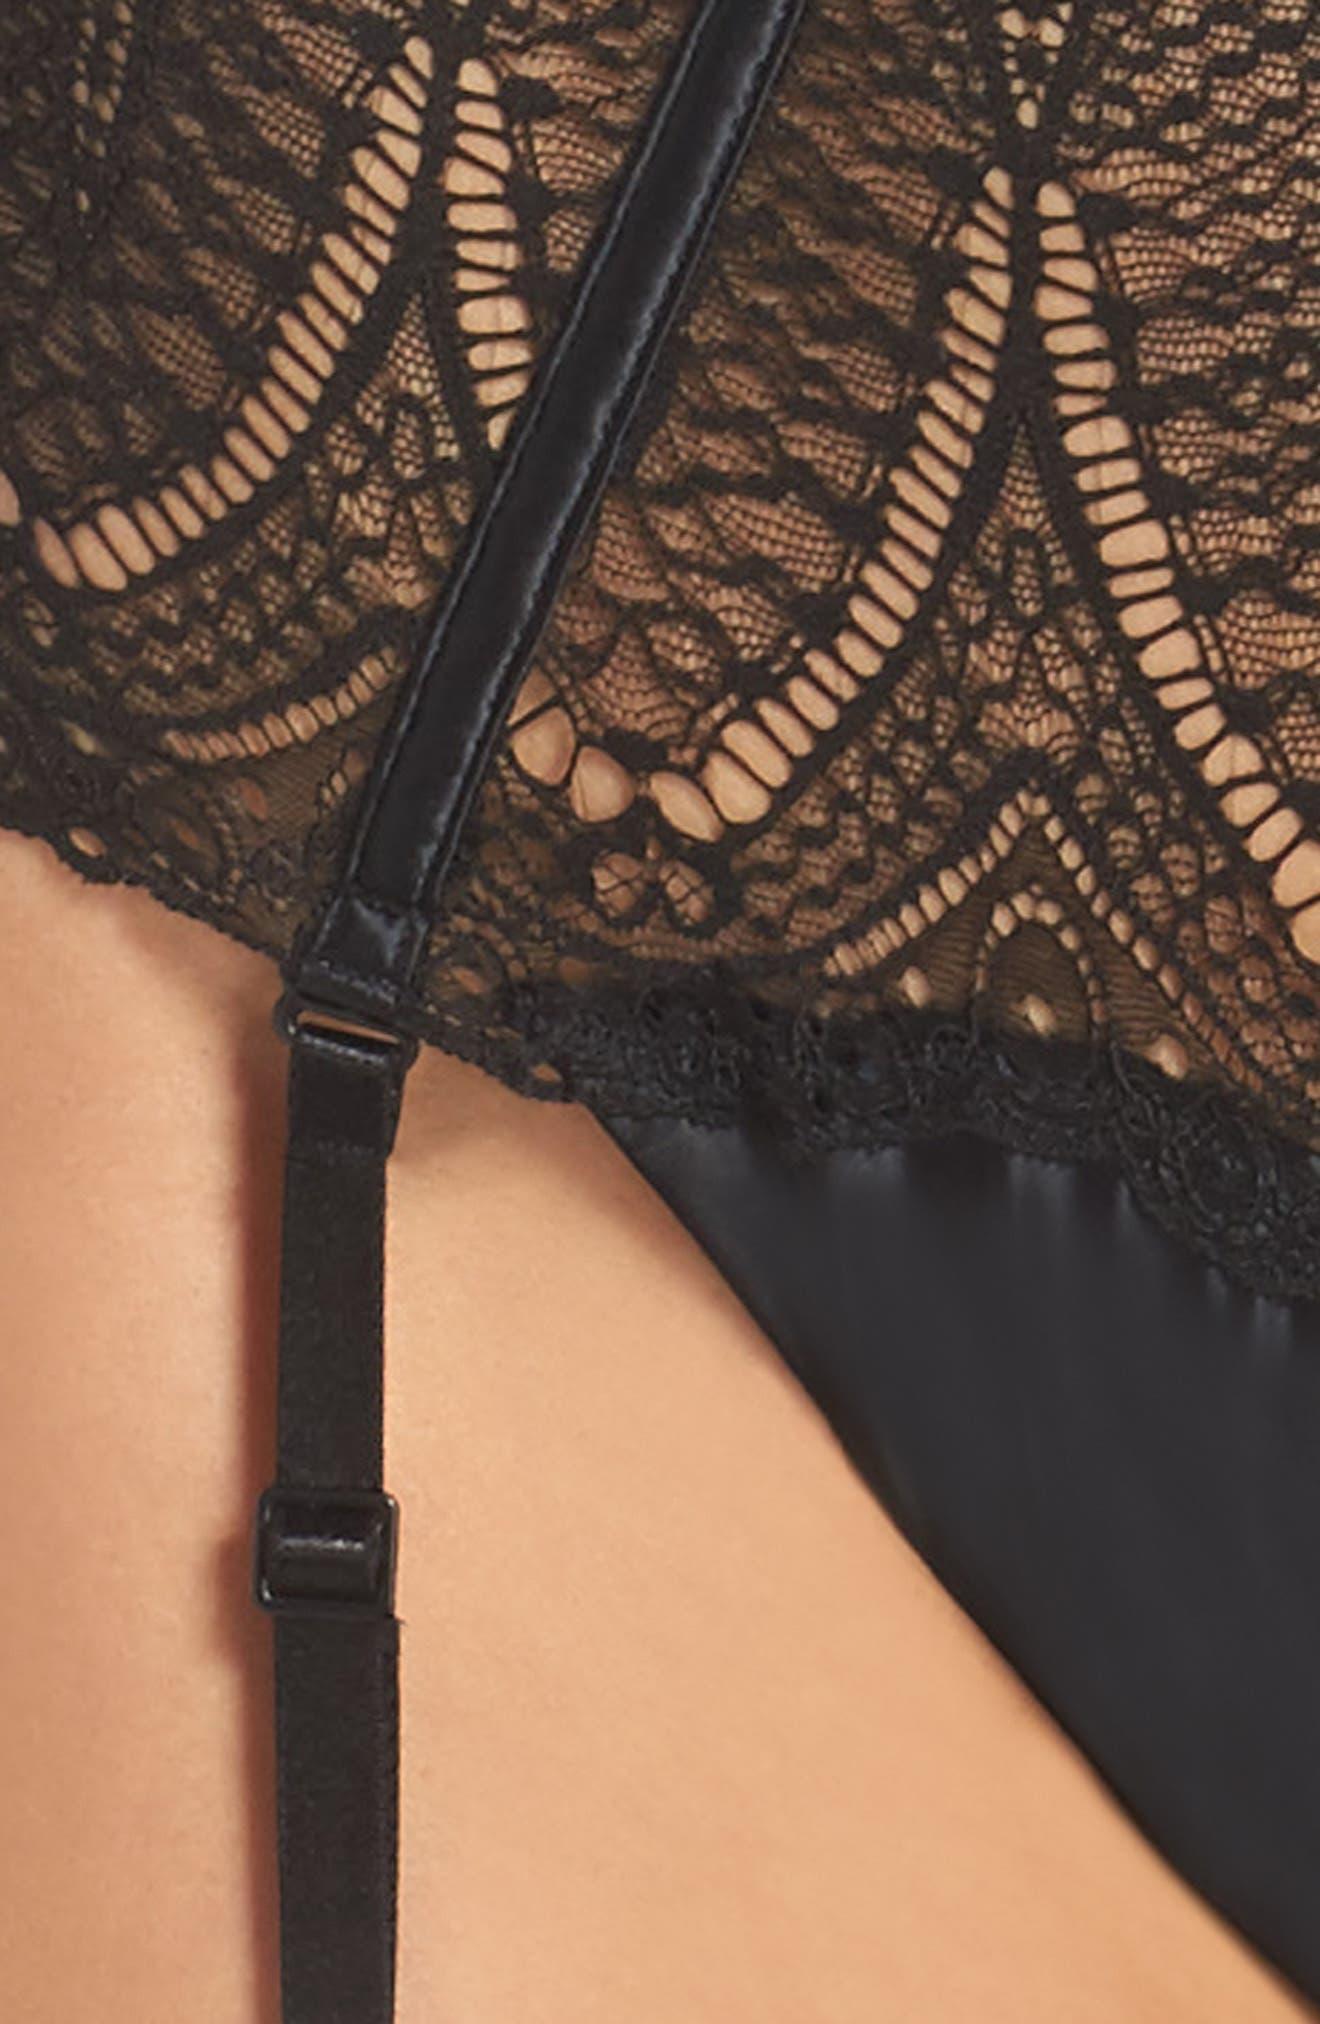 Black Audacious High Waist Lace Thong,                             Alternate thumbnail 5, color,